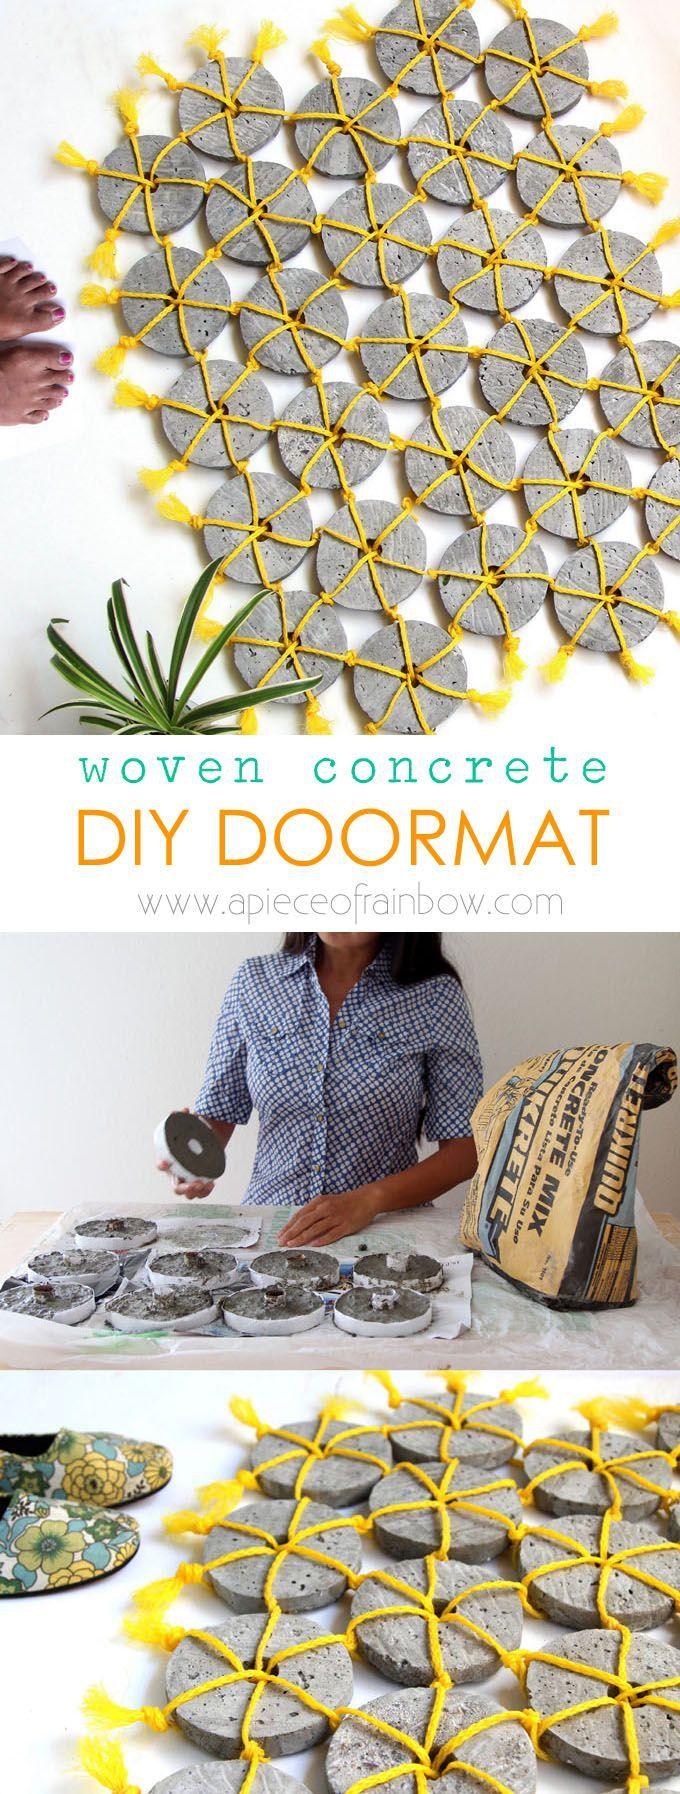 DIY Woven Concrete Doormat